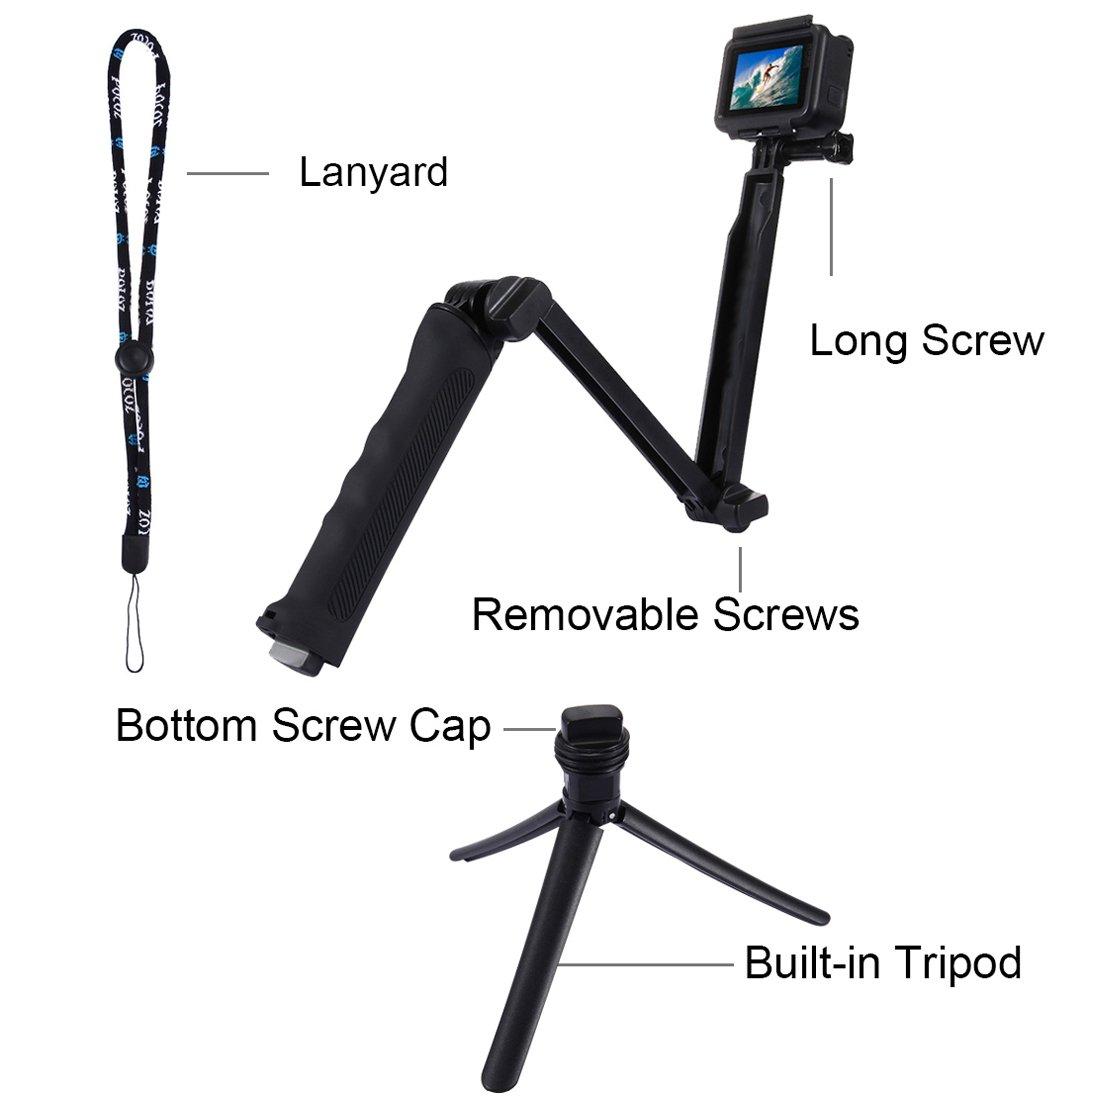 Awinning Multi Function Tripod Extendable Selfie Stick Metal Lid Pov Pole Monopod 49 Cm For Gopro Xiaomi Yi Blue Handheld Hero5 Hero4 Session Hero 5 4 3 2 1 Sjcam Sj4000 Pu202